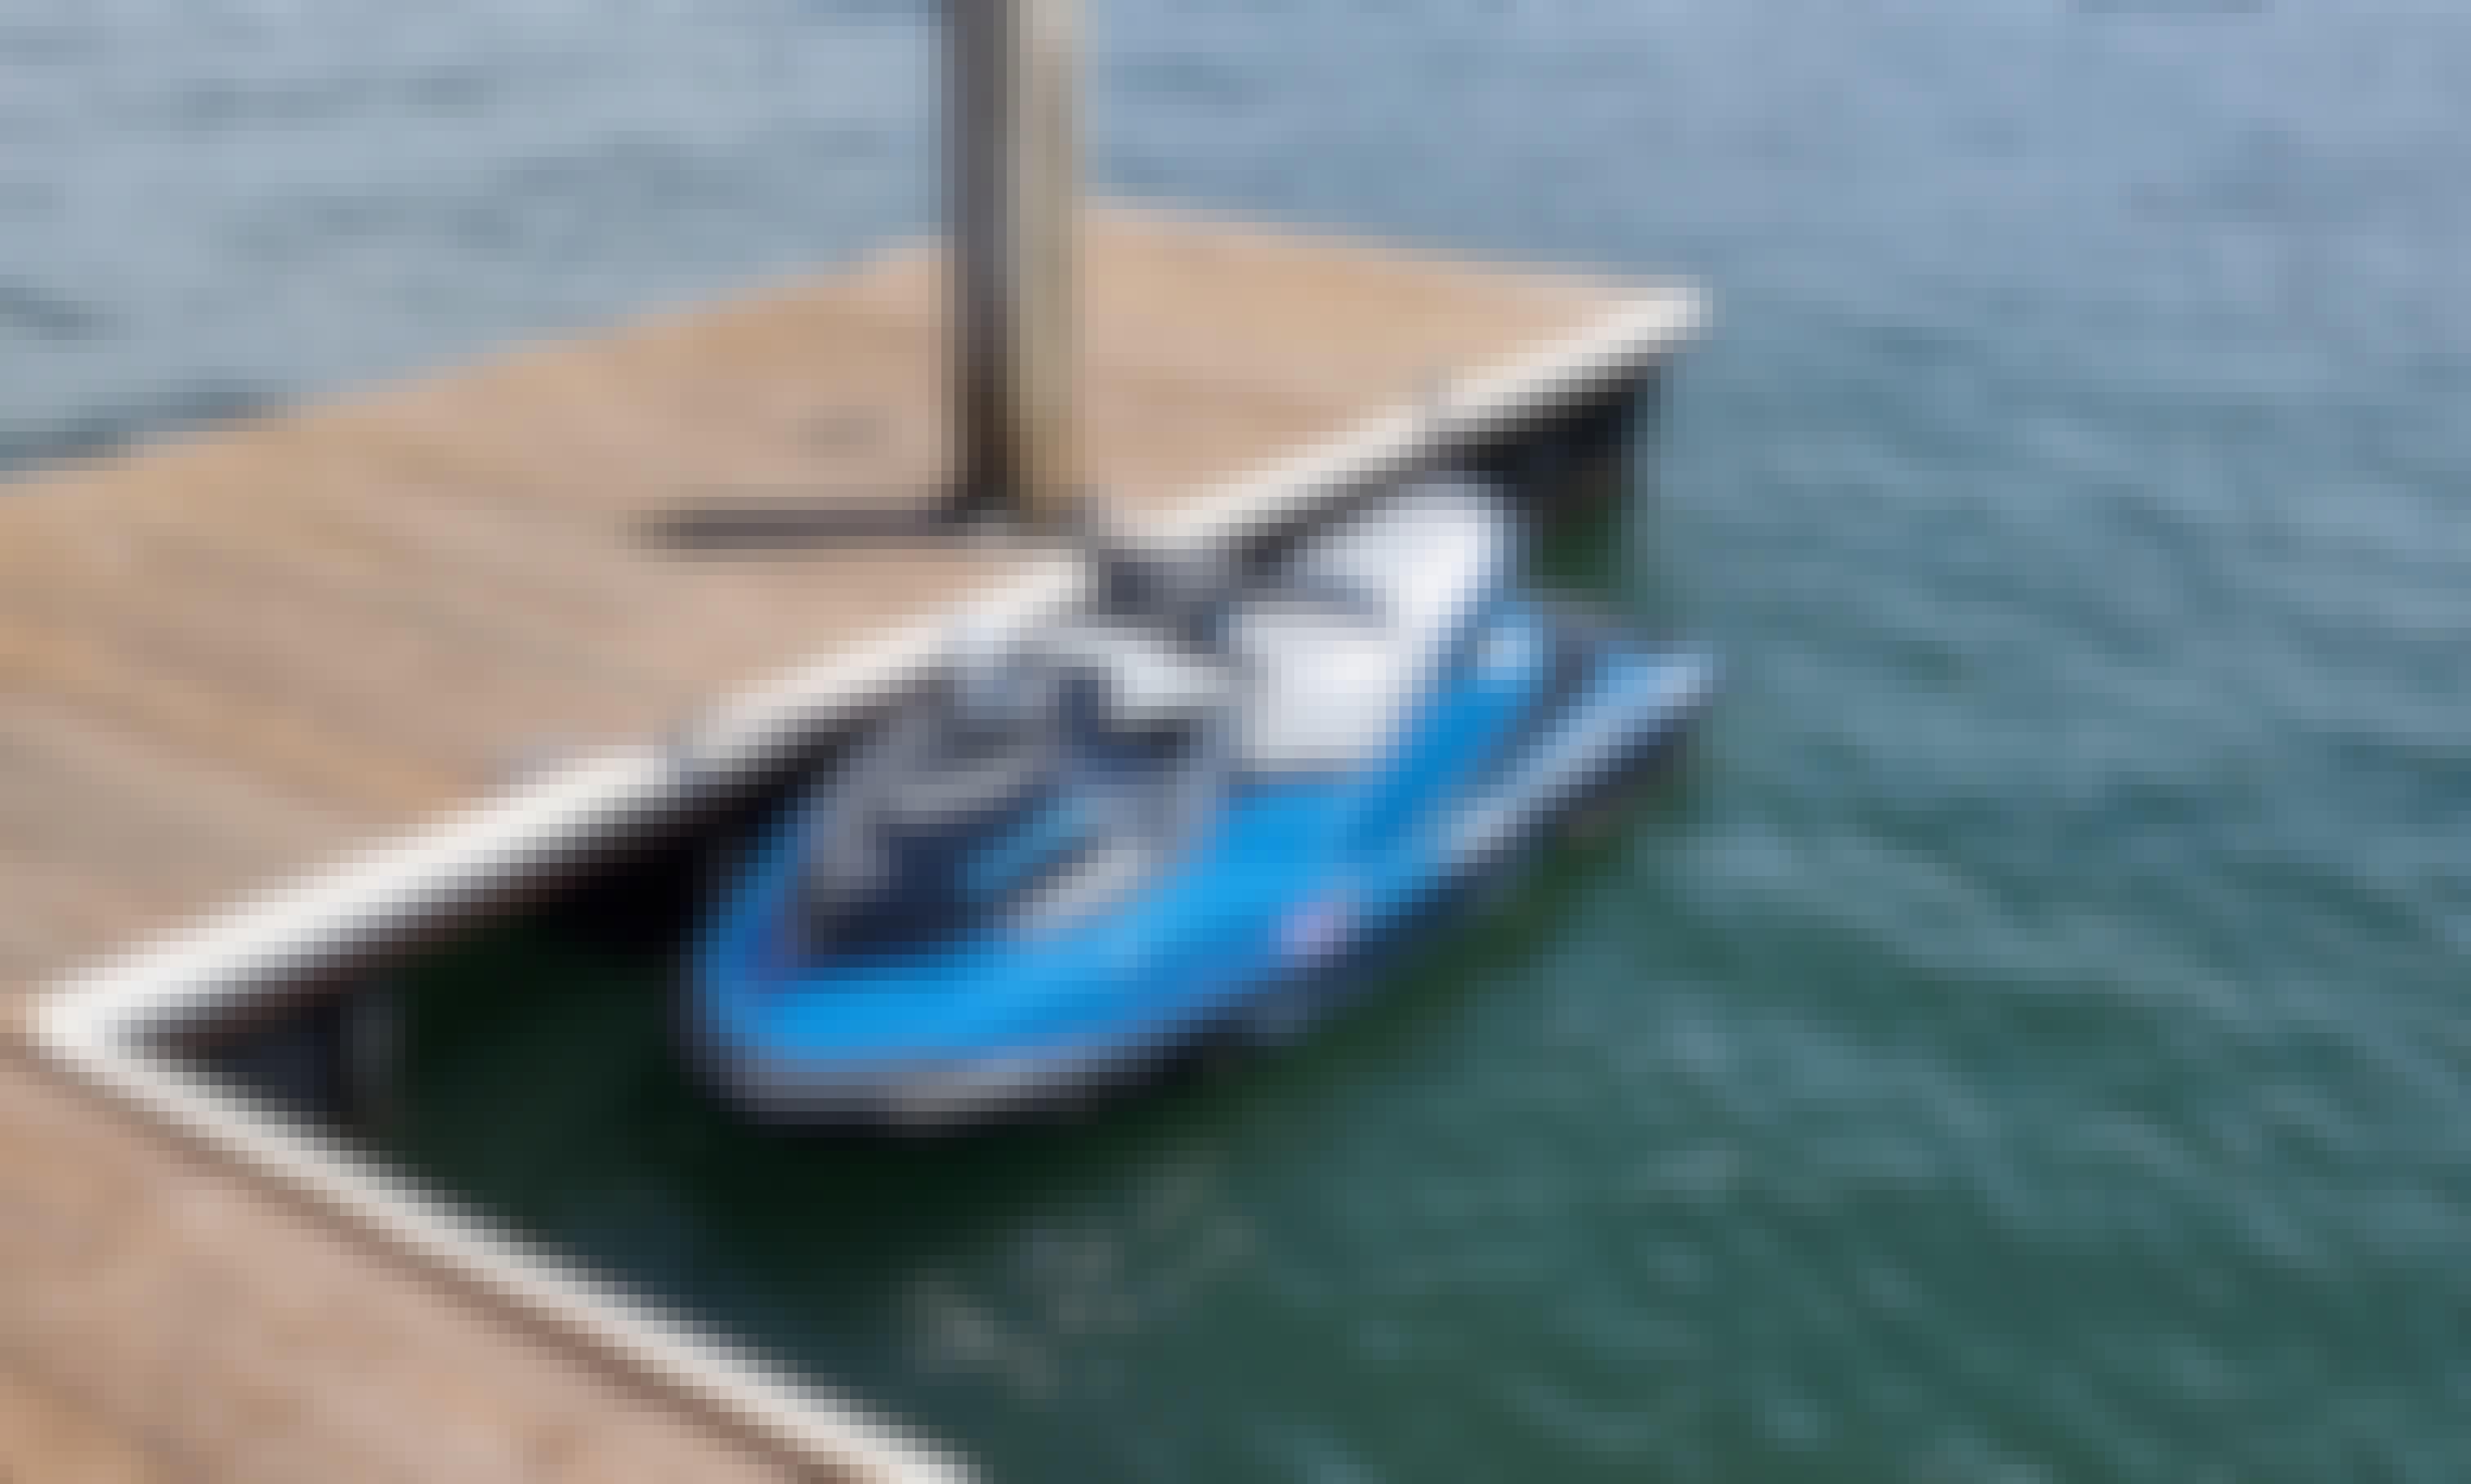 2018 Sea Doo GTI 155 Rental! Ride in style